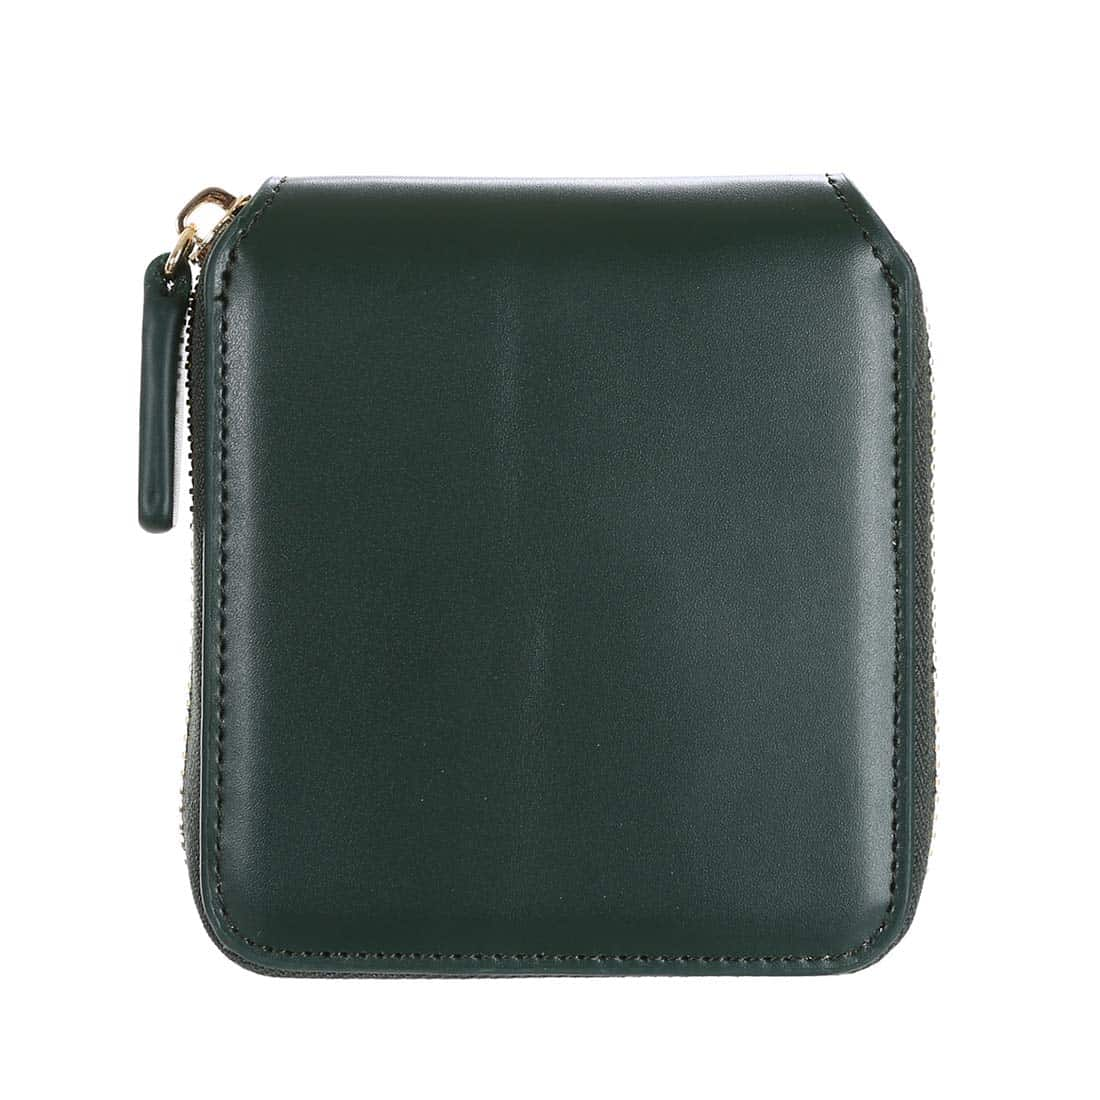 Dompet Miniso Terbaik Miniso Simple Zippered Wallet